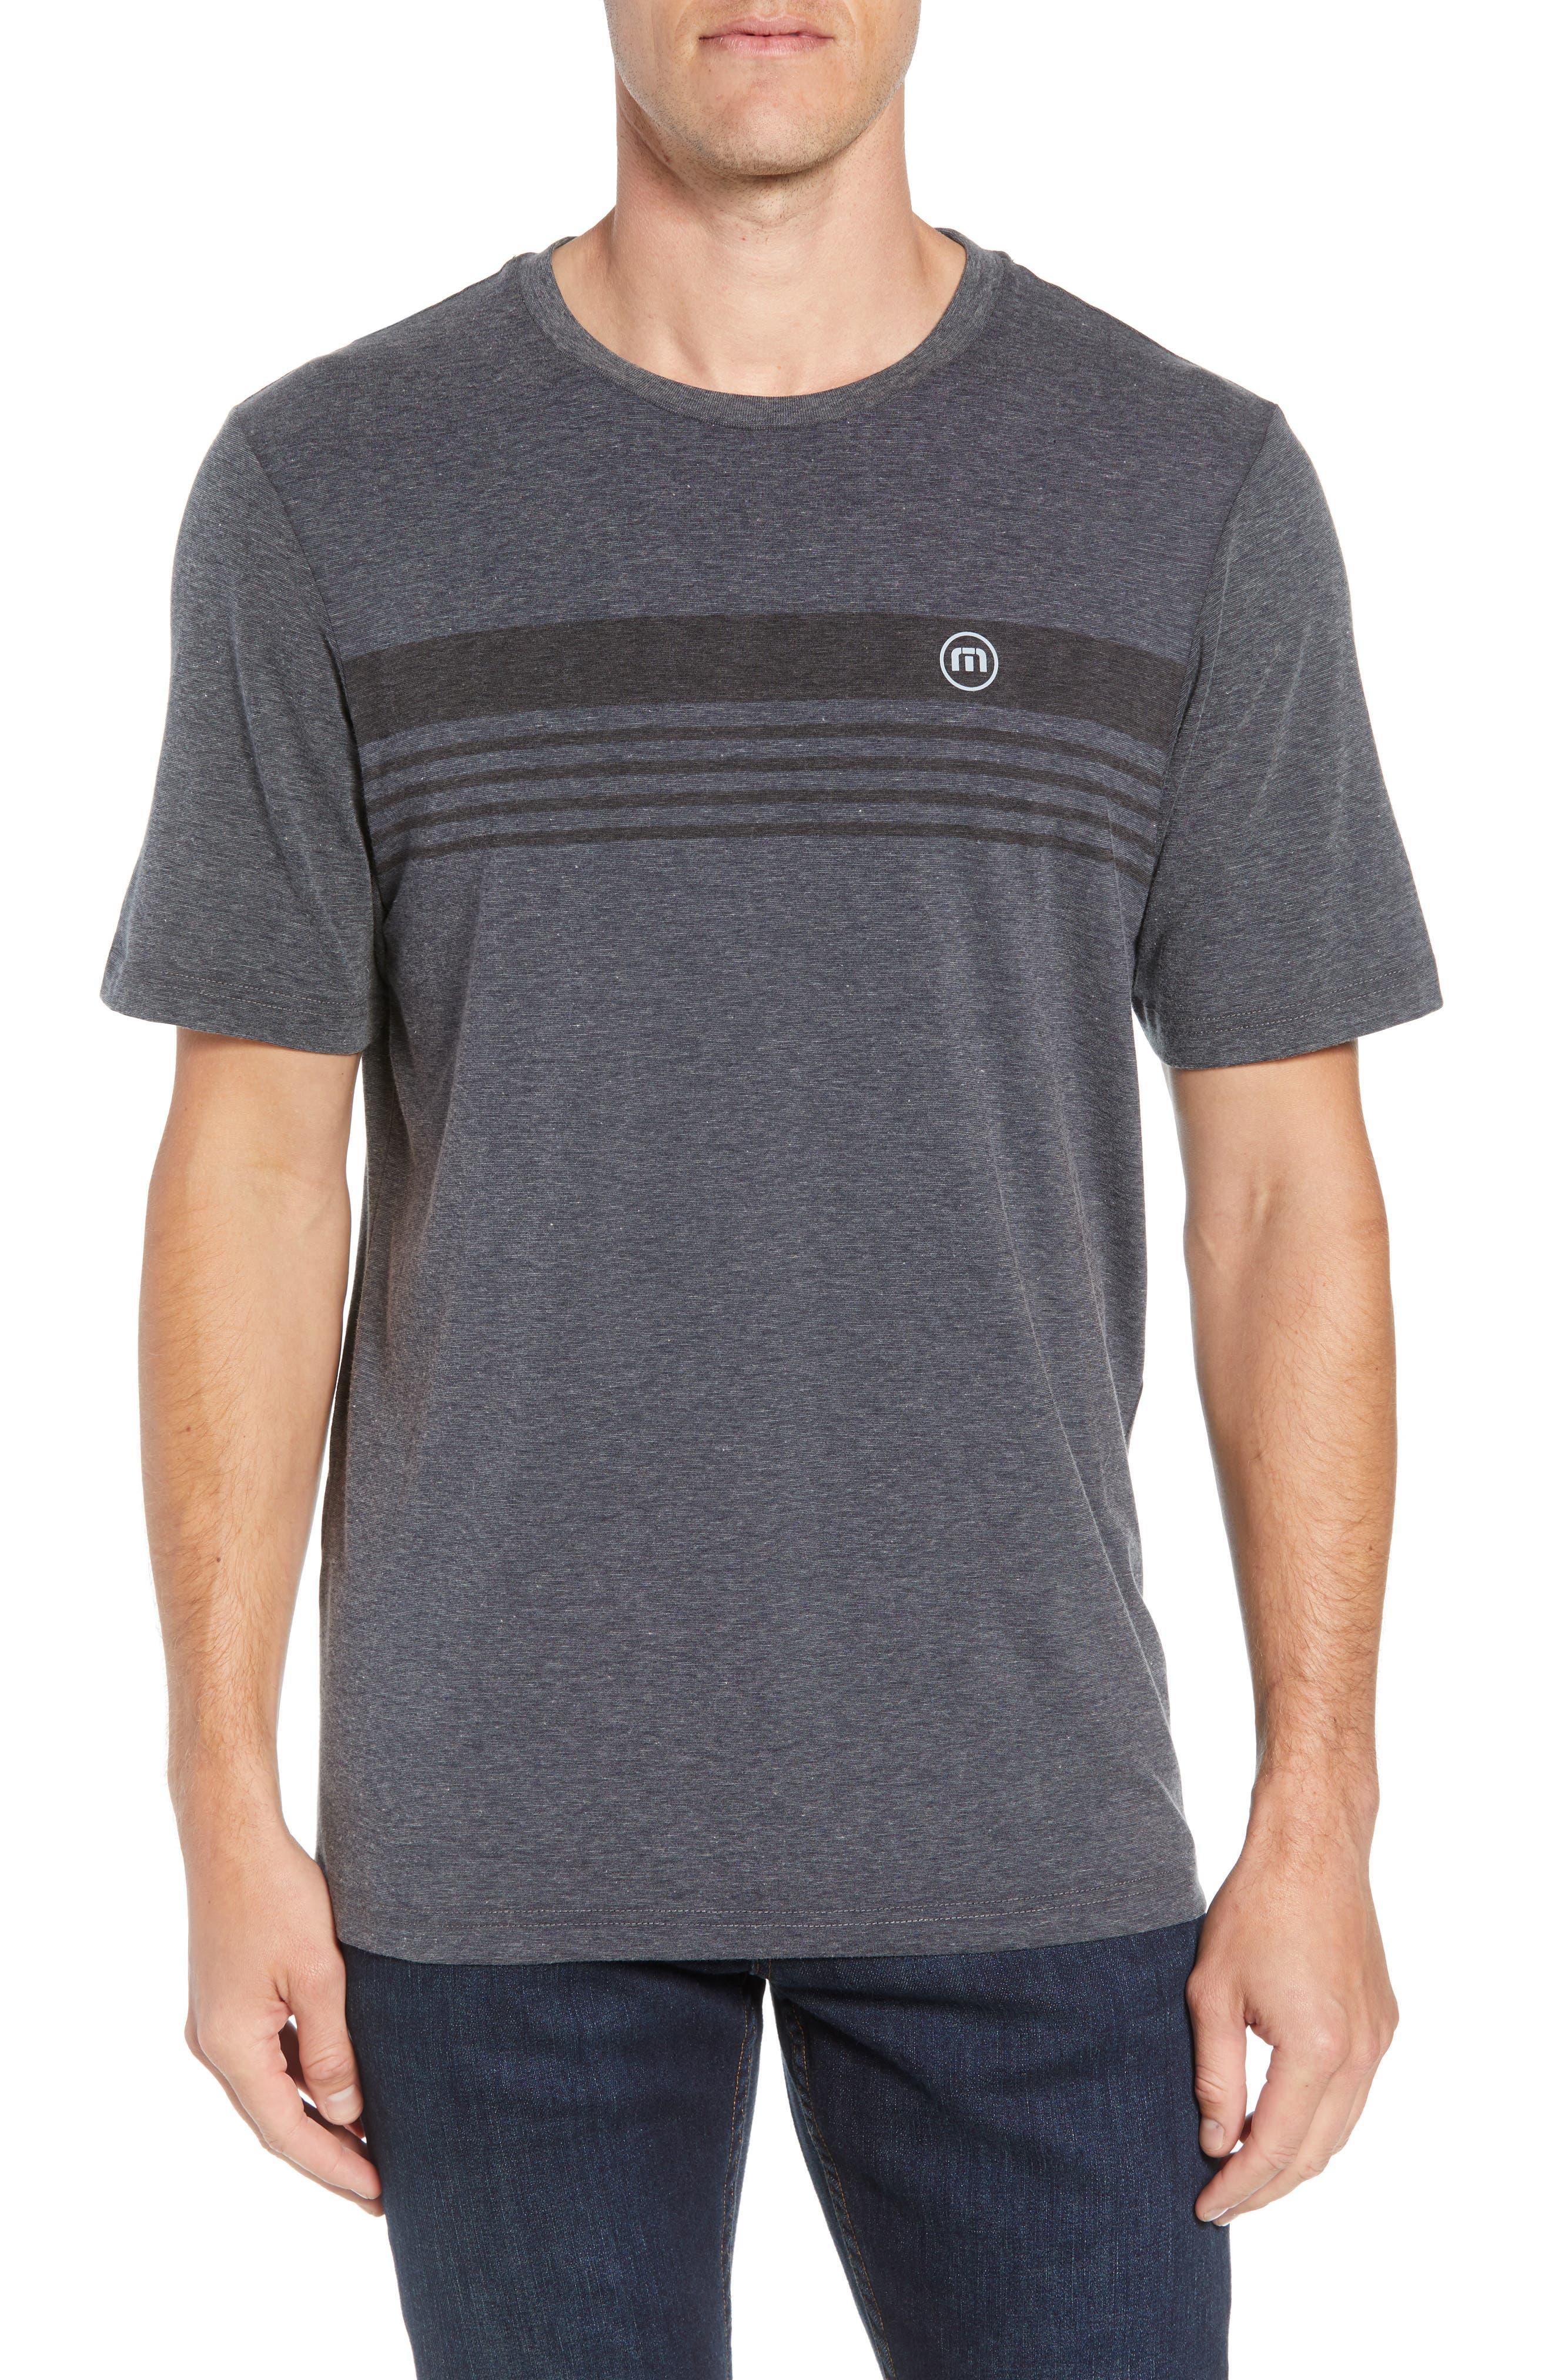 Recline Performance T-Shirt,                         Main,                         color, HEATHER MAGNET